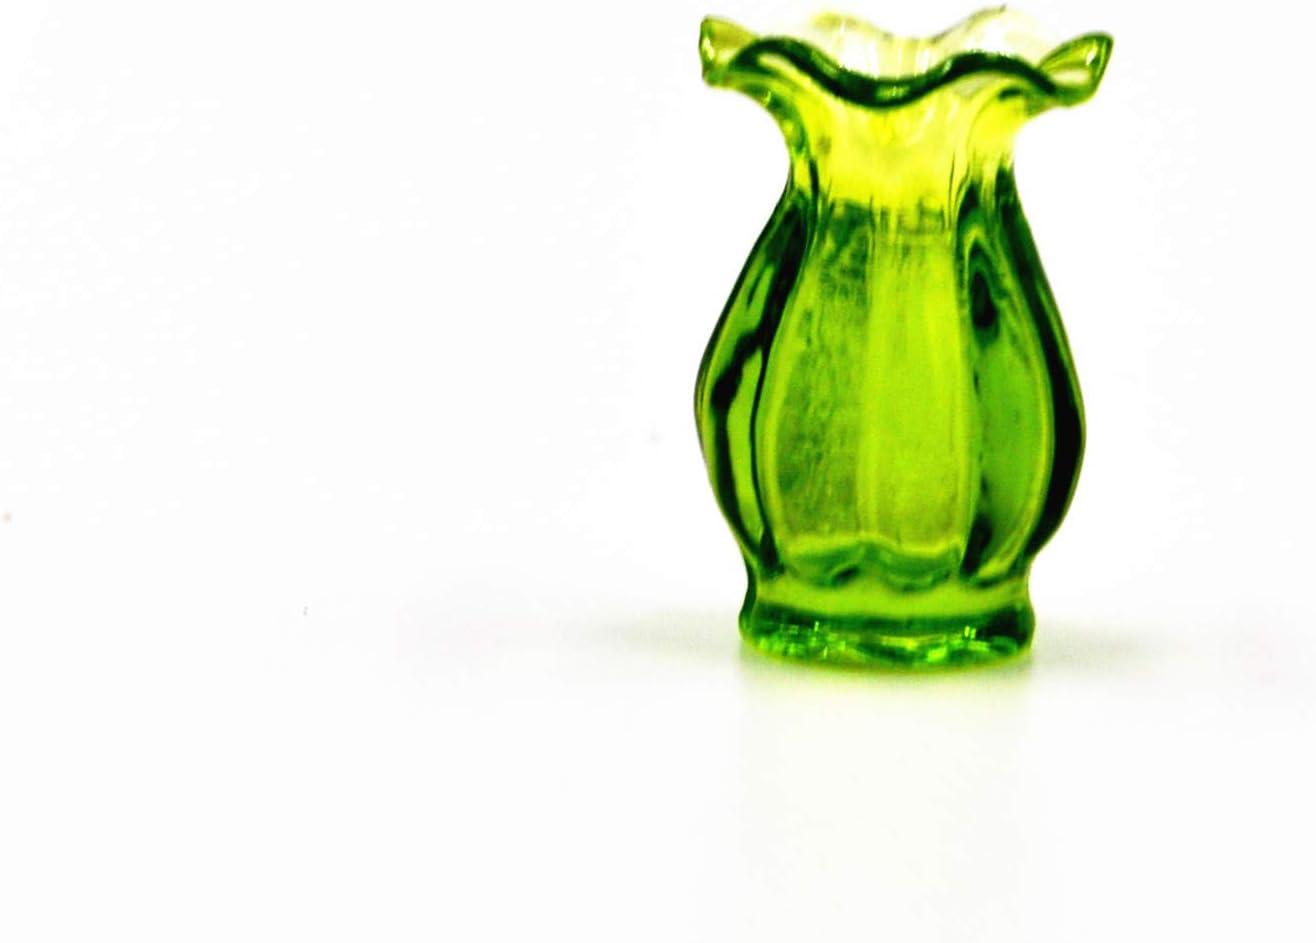 Togudot Dollhouse Miniature Vase Model Mini Simulation Glass Ornaments Decoration Accessories